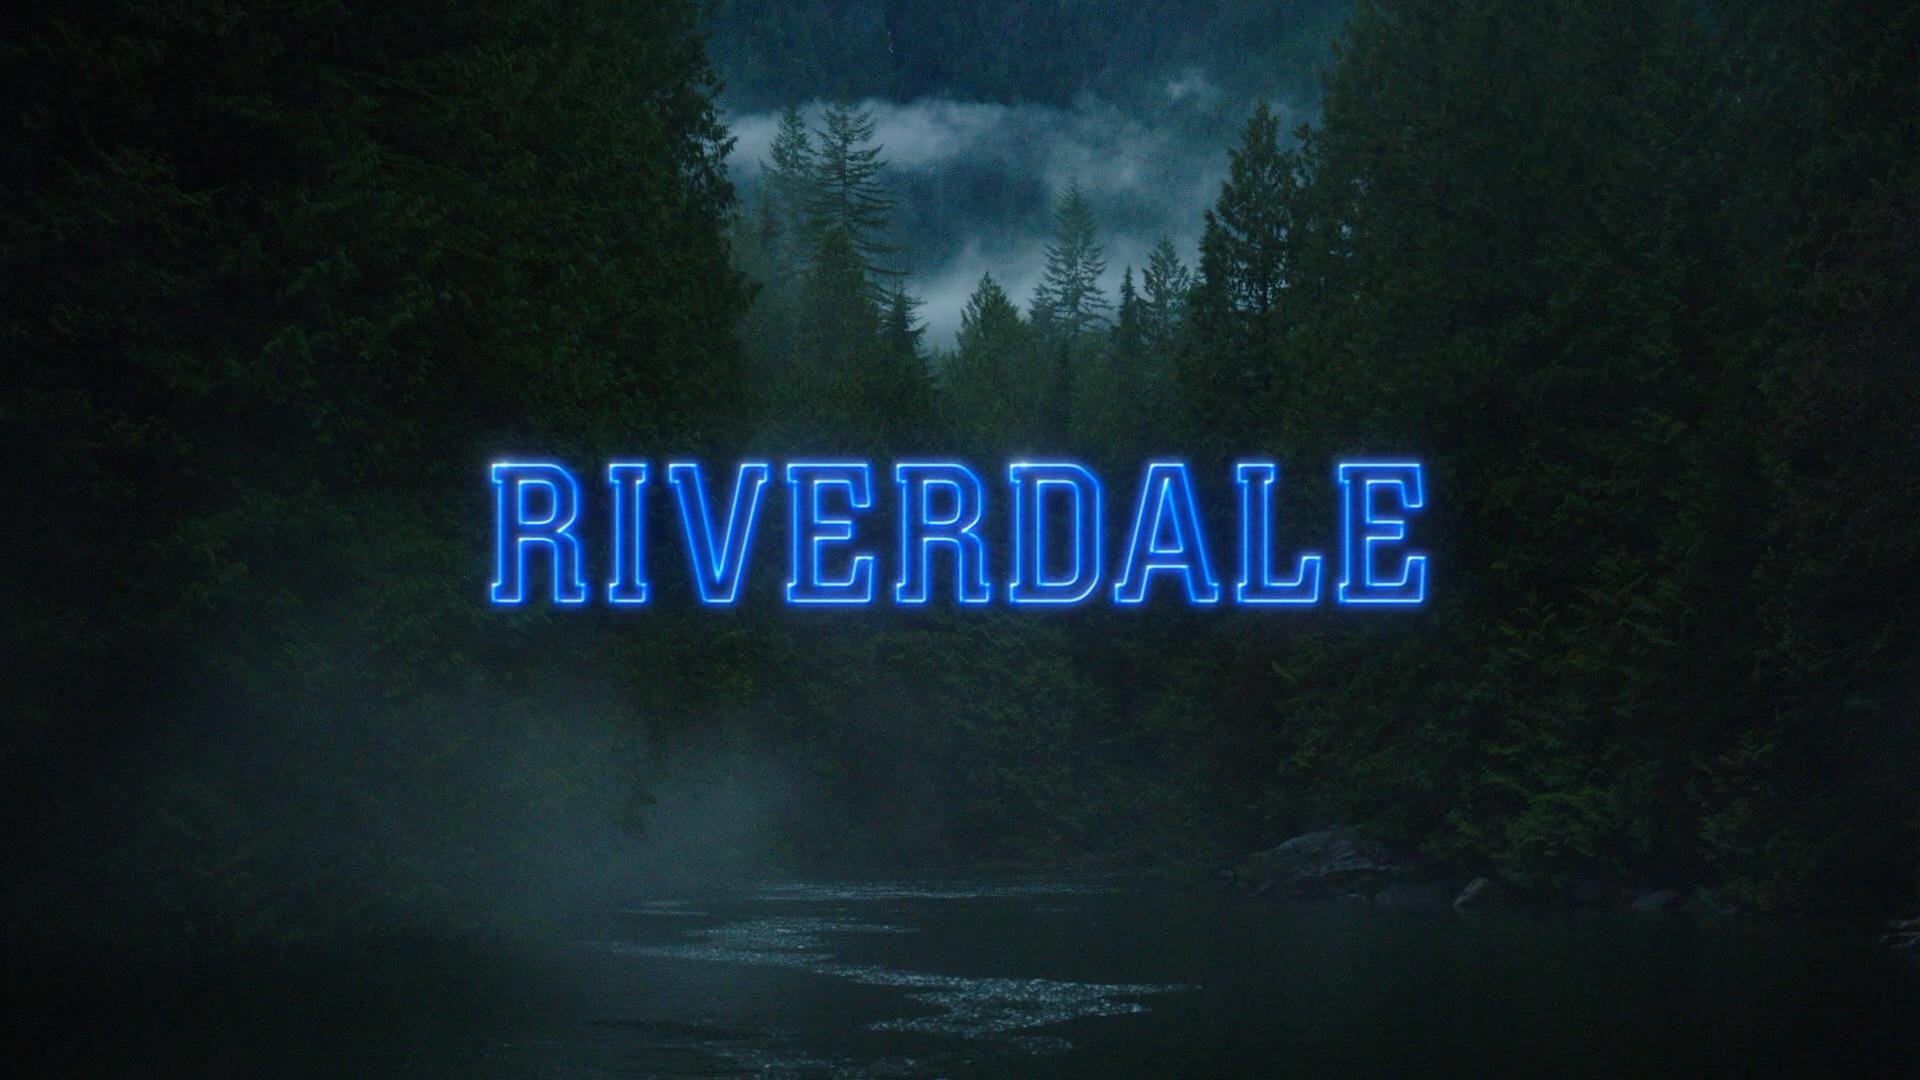 Pin By Elisa On Riverdale Riverdale Riverdale Poster Riverdale Aesthetic